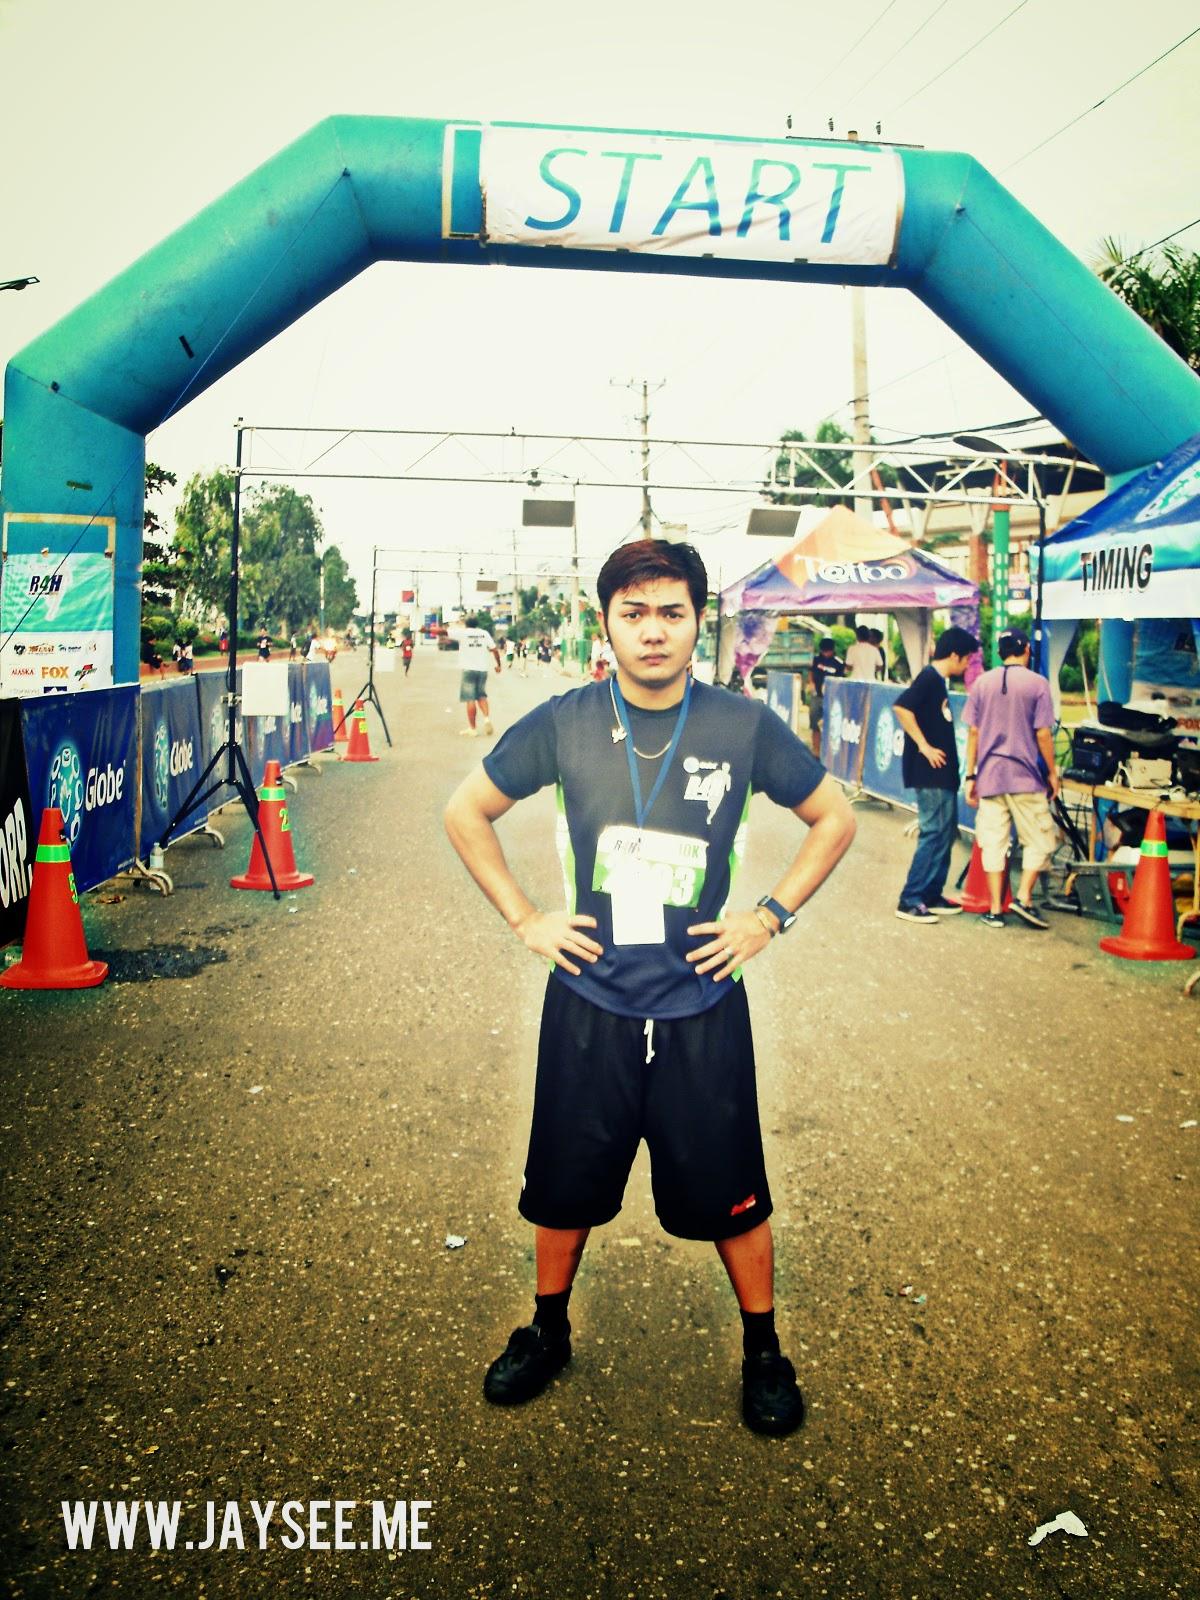 Being fierce at the marathon starting point after warm-up.